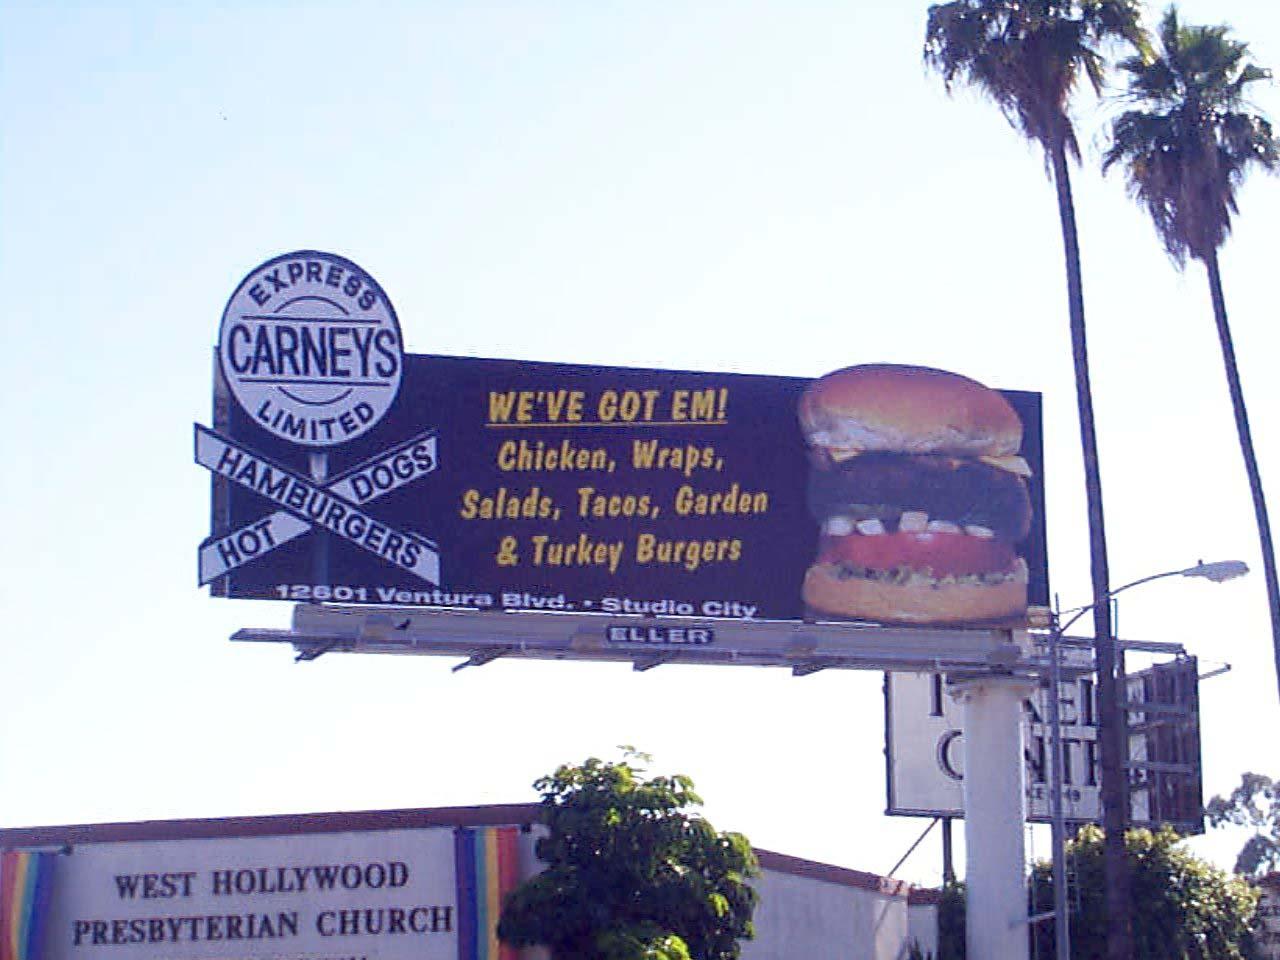 Carneys billboard